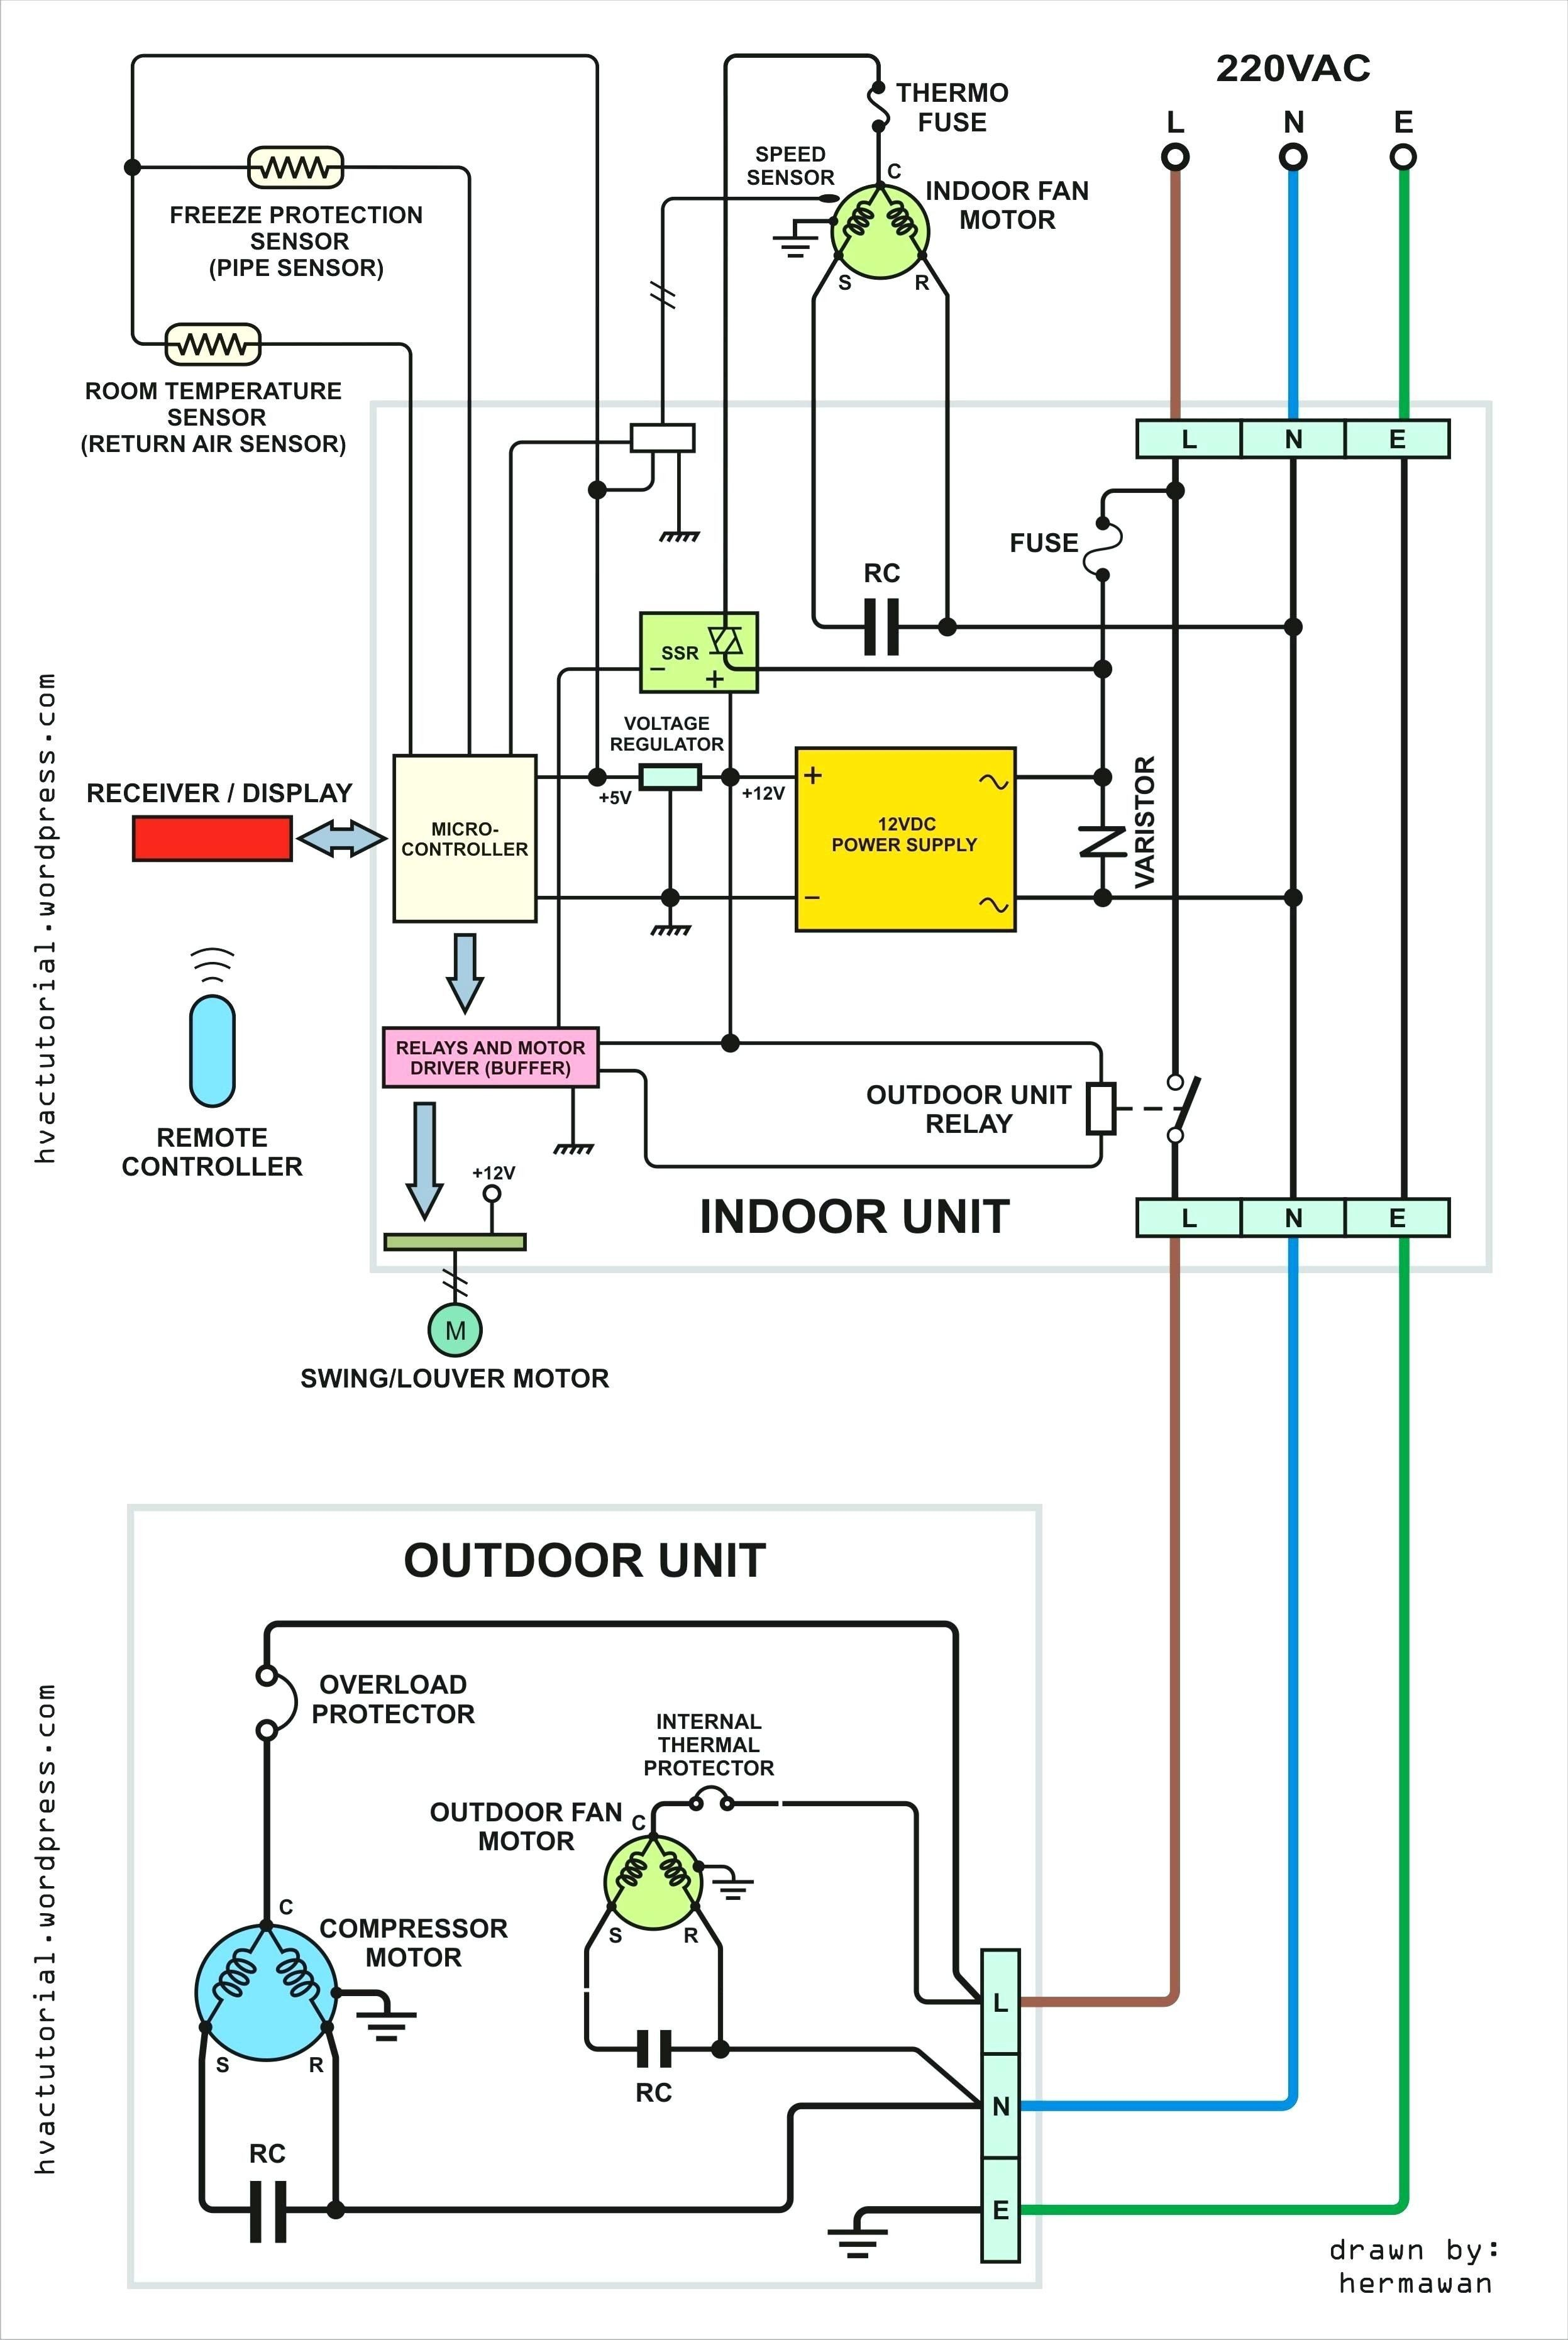 Westinghouse Ac Motor Wiring Diagram Old Motor Wiring Diagrams Schema Wiring Diagram Of Westinghouse Ac Motor Wiring Diagram